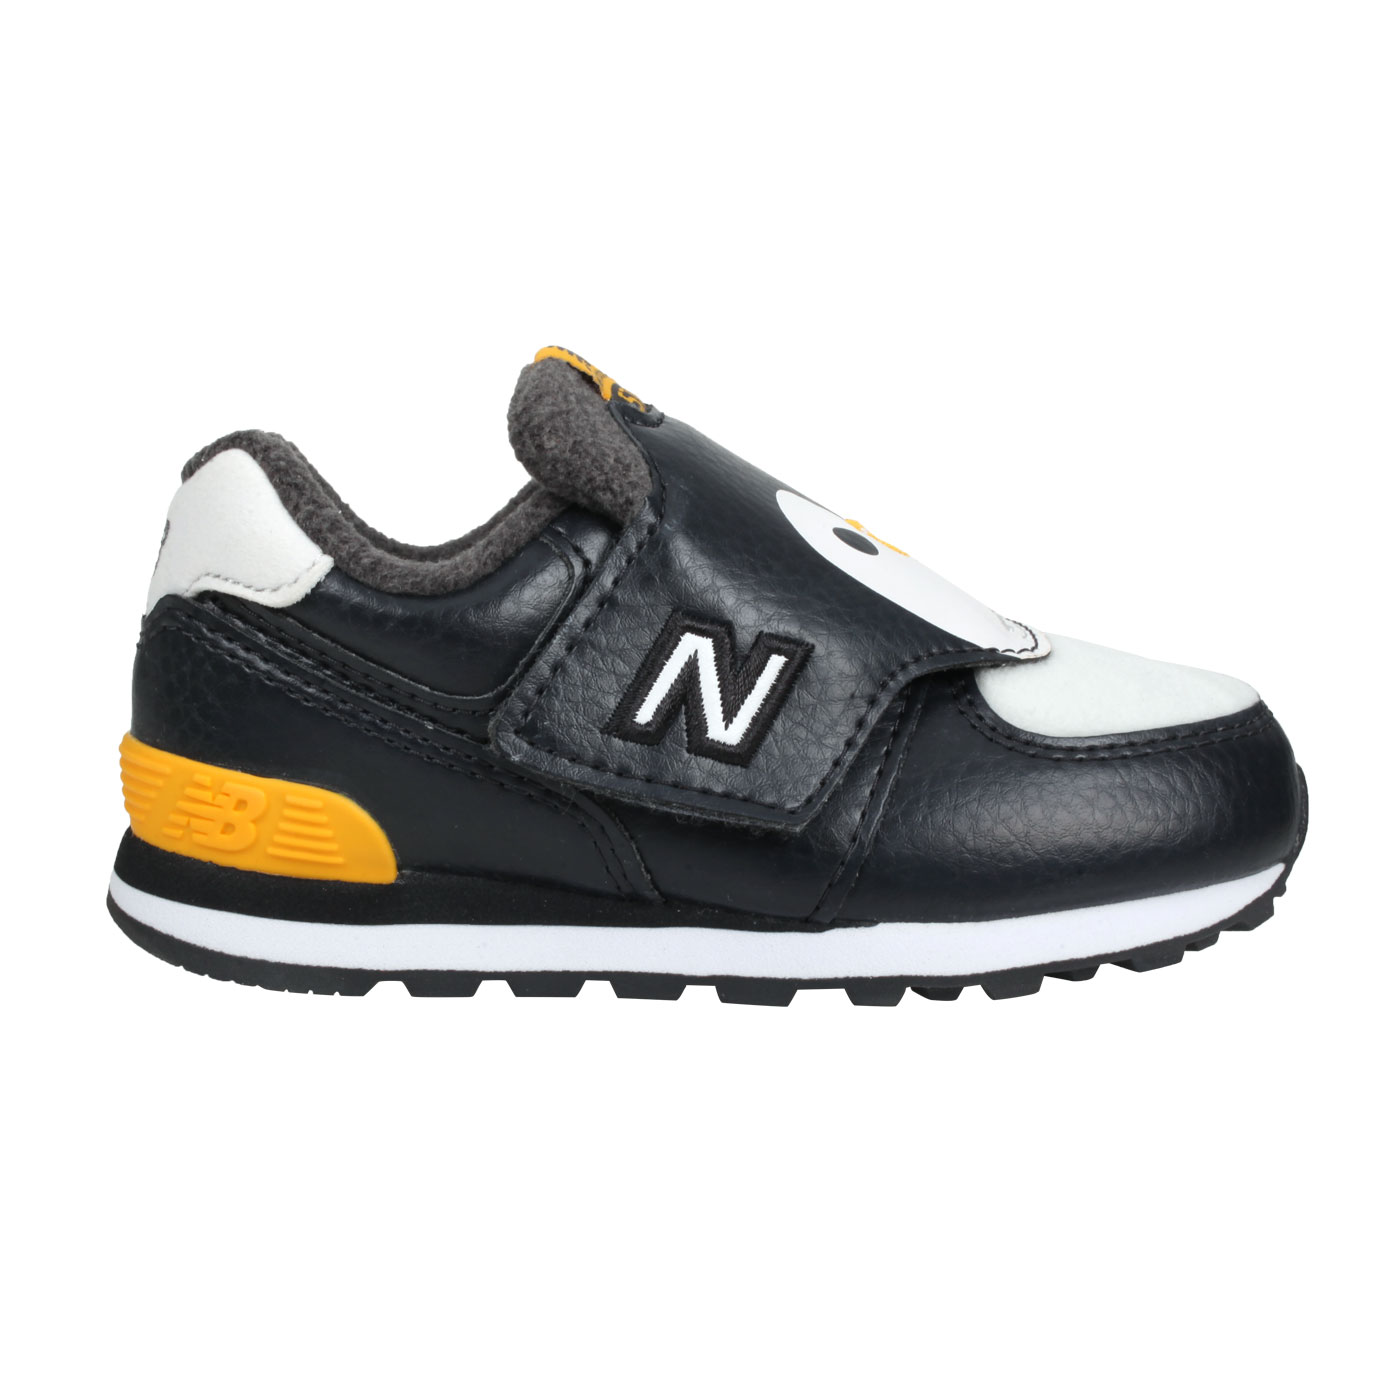 NEW BALANCE 小童休閒鞋 IV574AQP - 黑黃白